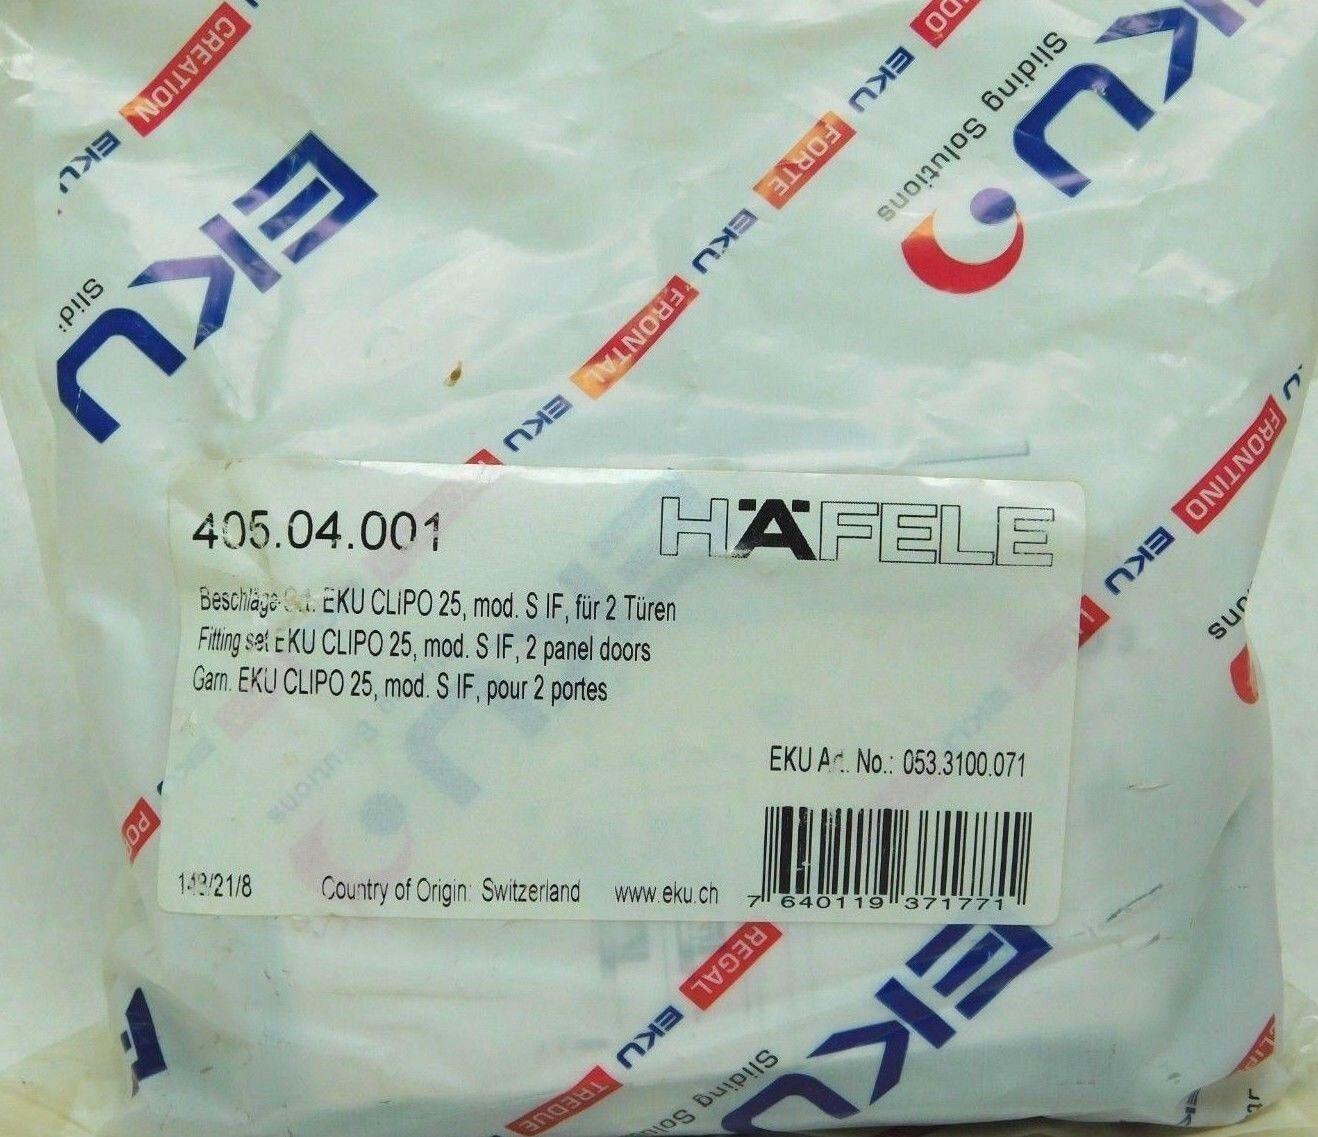 NEW  Hafele 405.04.001 Inslide Set for 2 Wood Panel Doors SEE PHOTOS  HF